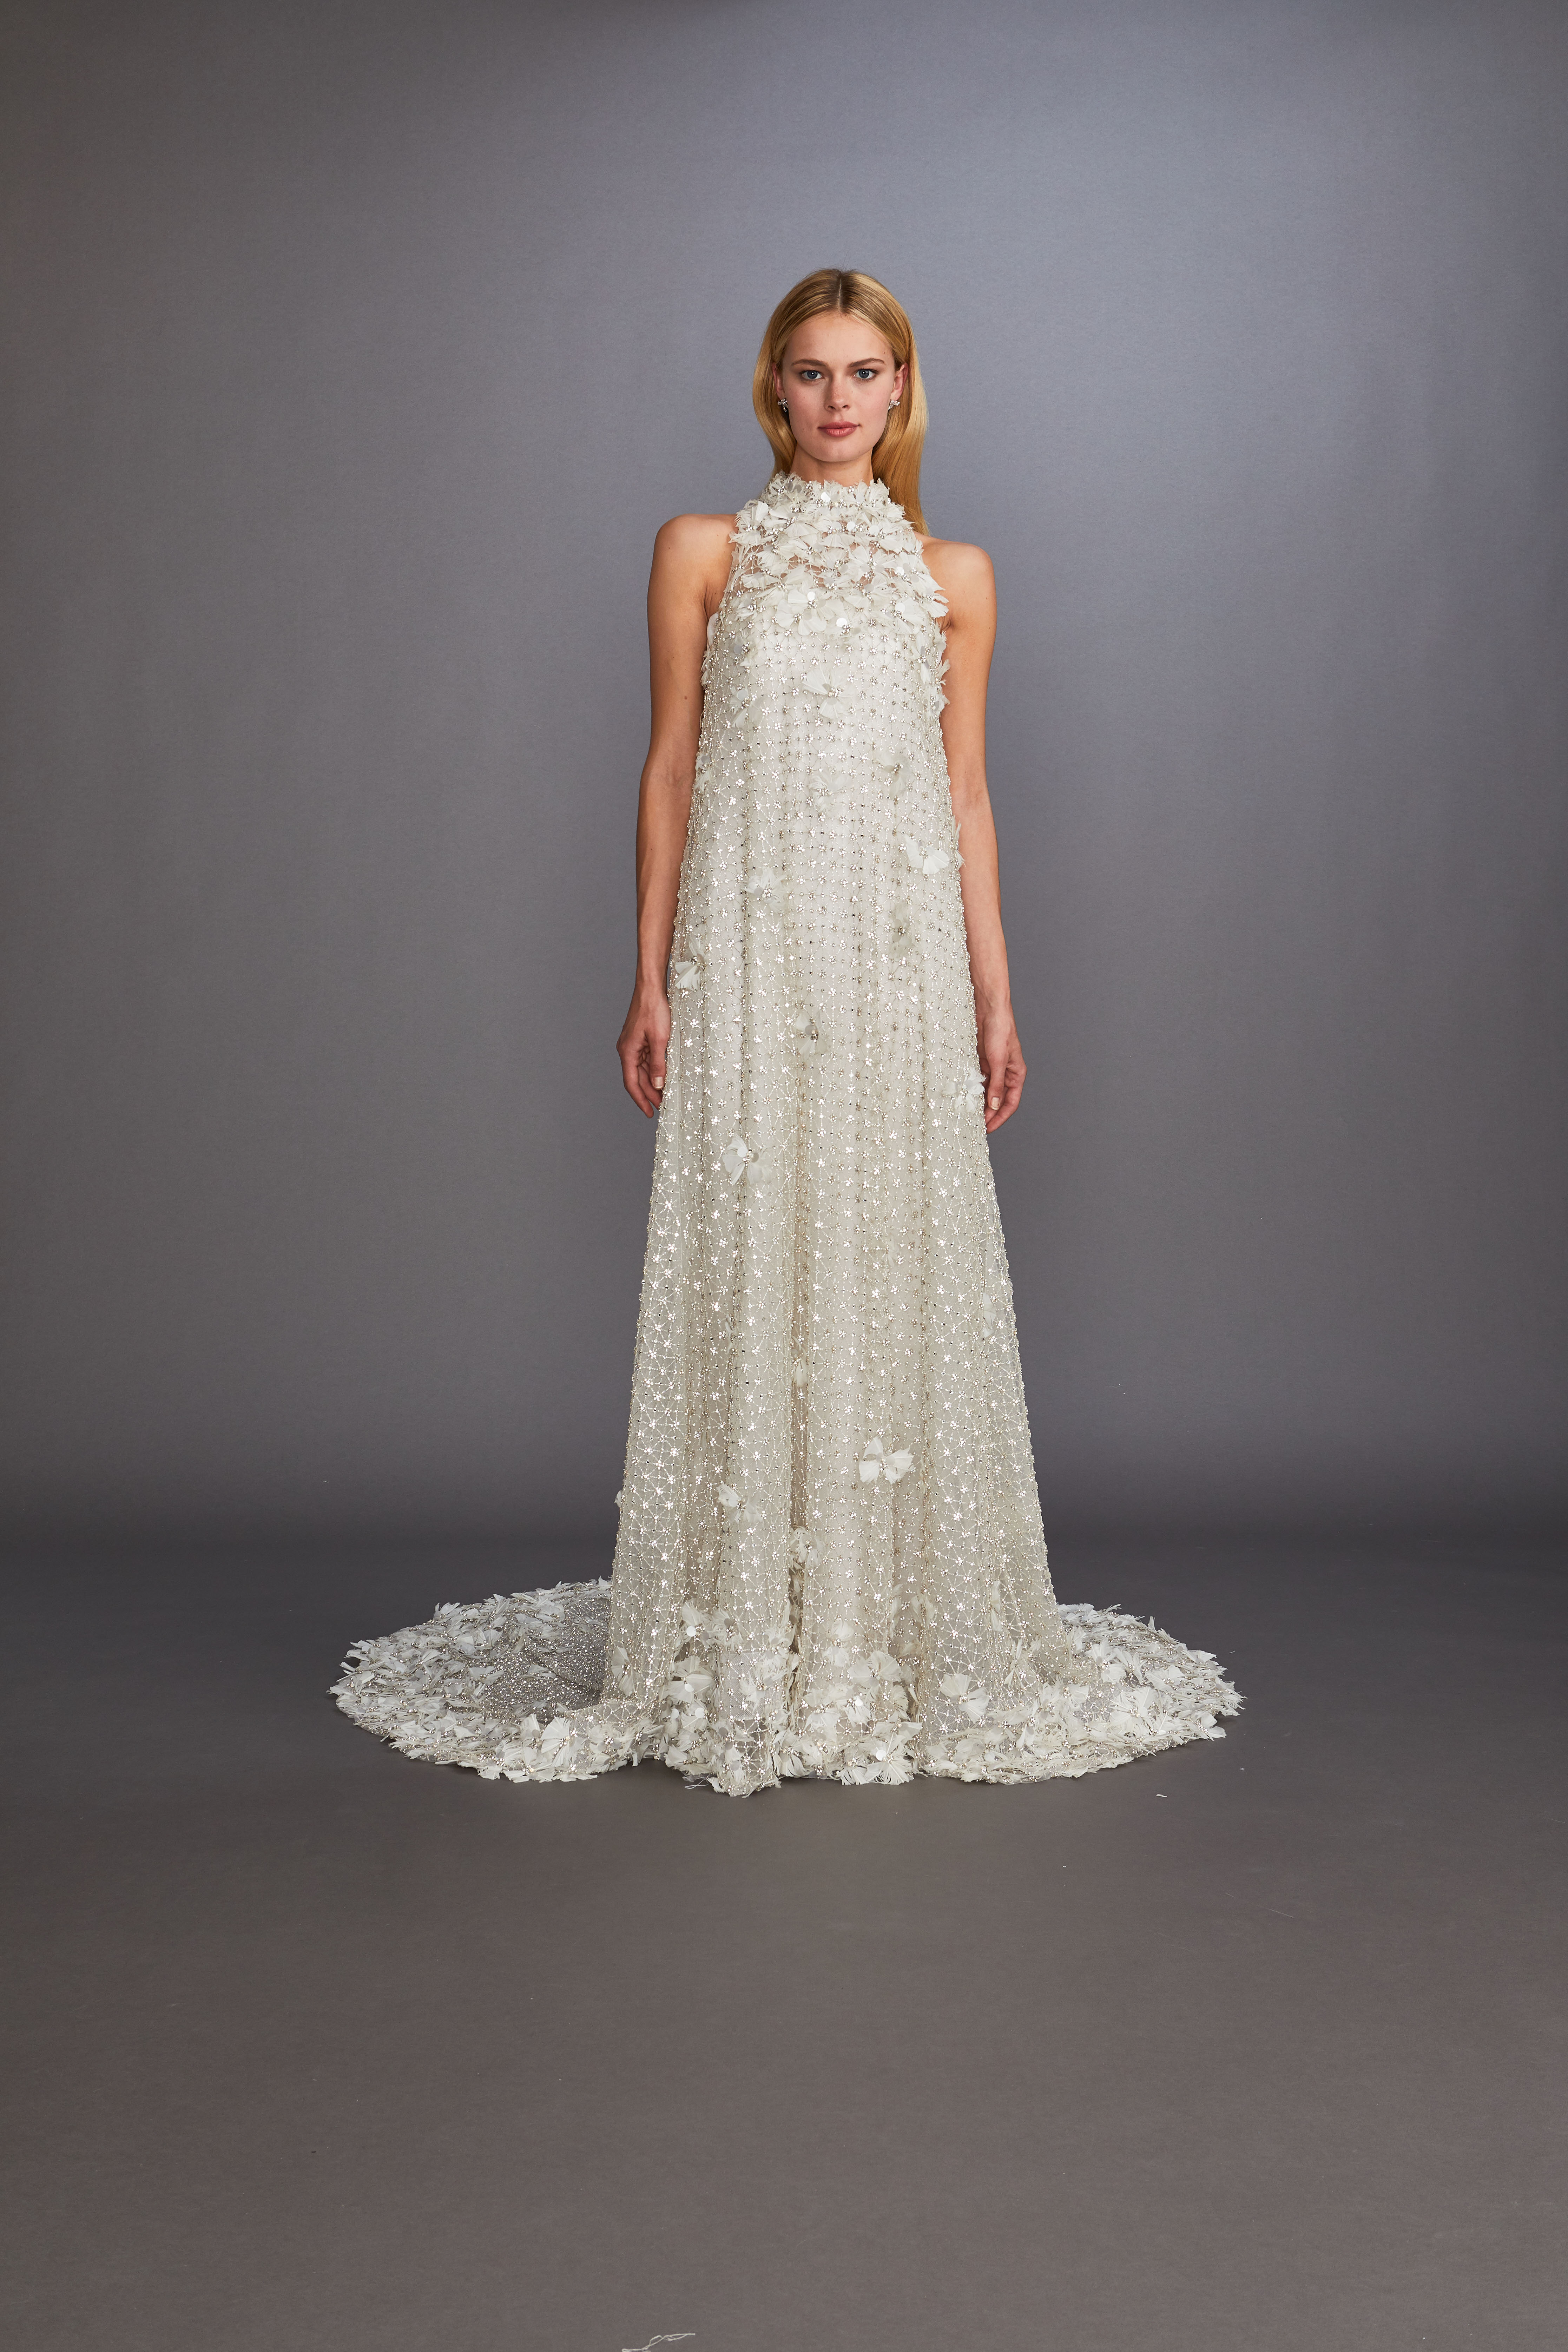 high neck sleeveless beaded floral appilque sheath wedding dress Allison Webb Spring 2020